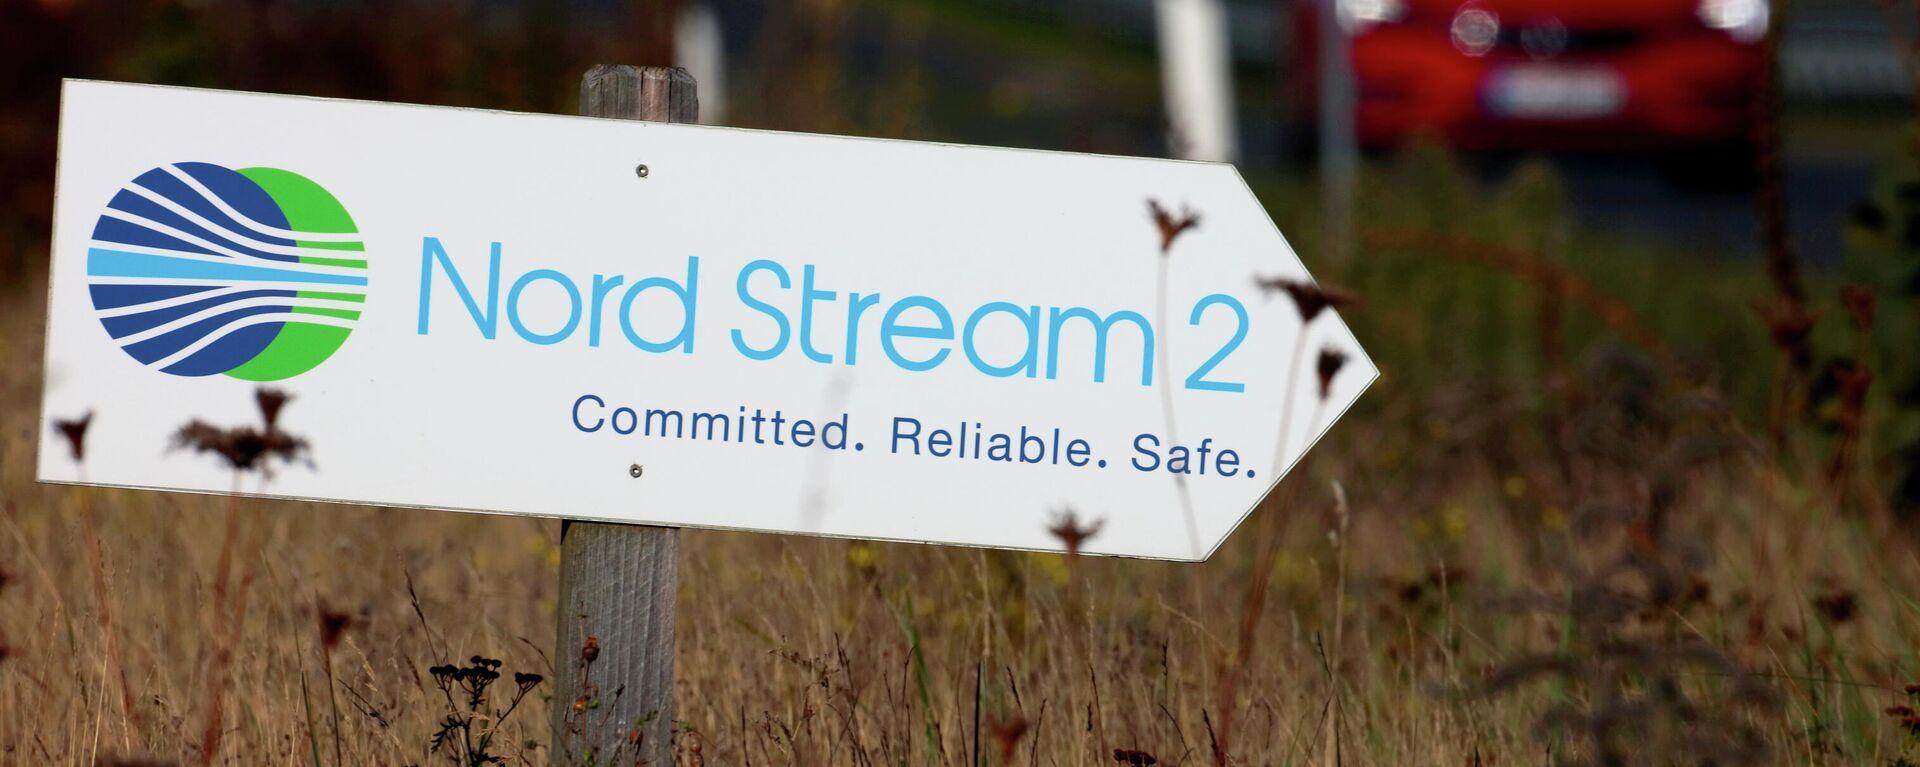 Nord Stream 2 - SNA, 1920, 14.09.2021